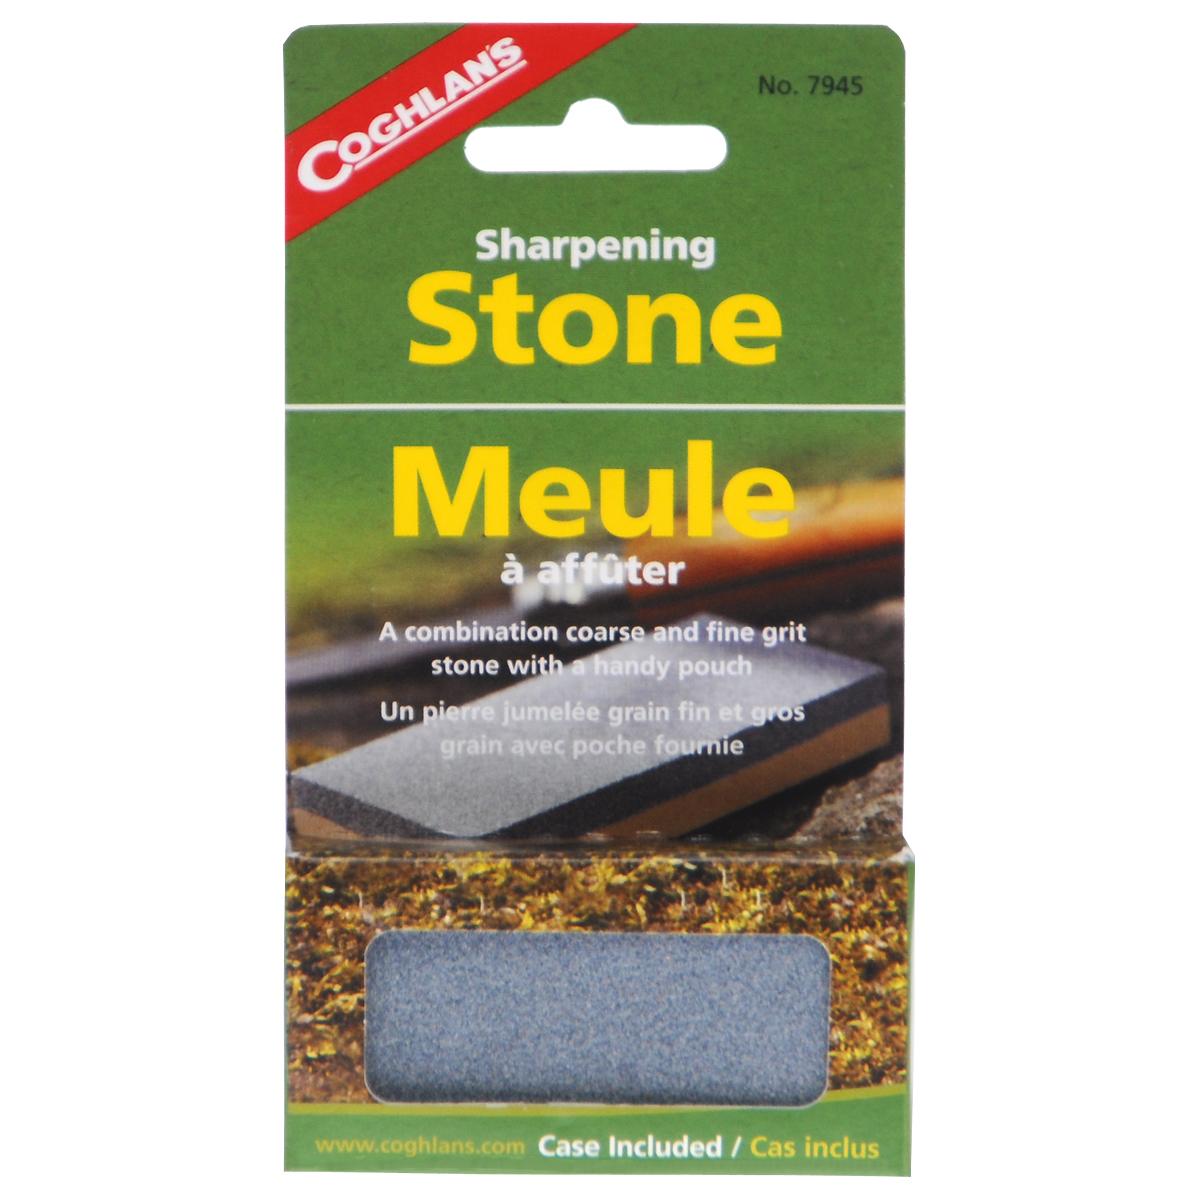 Камень точильный Coghlan's, двухсторонний, с футляром, 7,5 см х 3,5 см точильный камень truper 235 х 35 х 16 мм